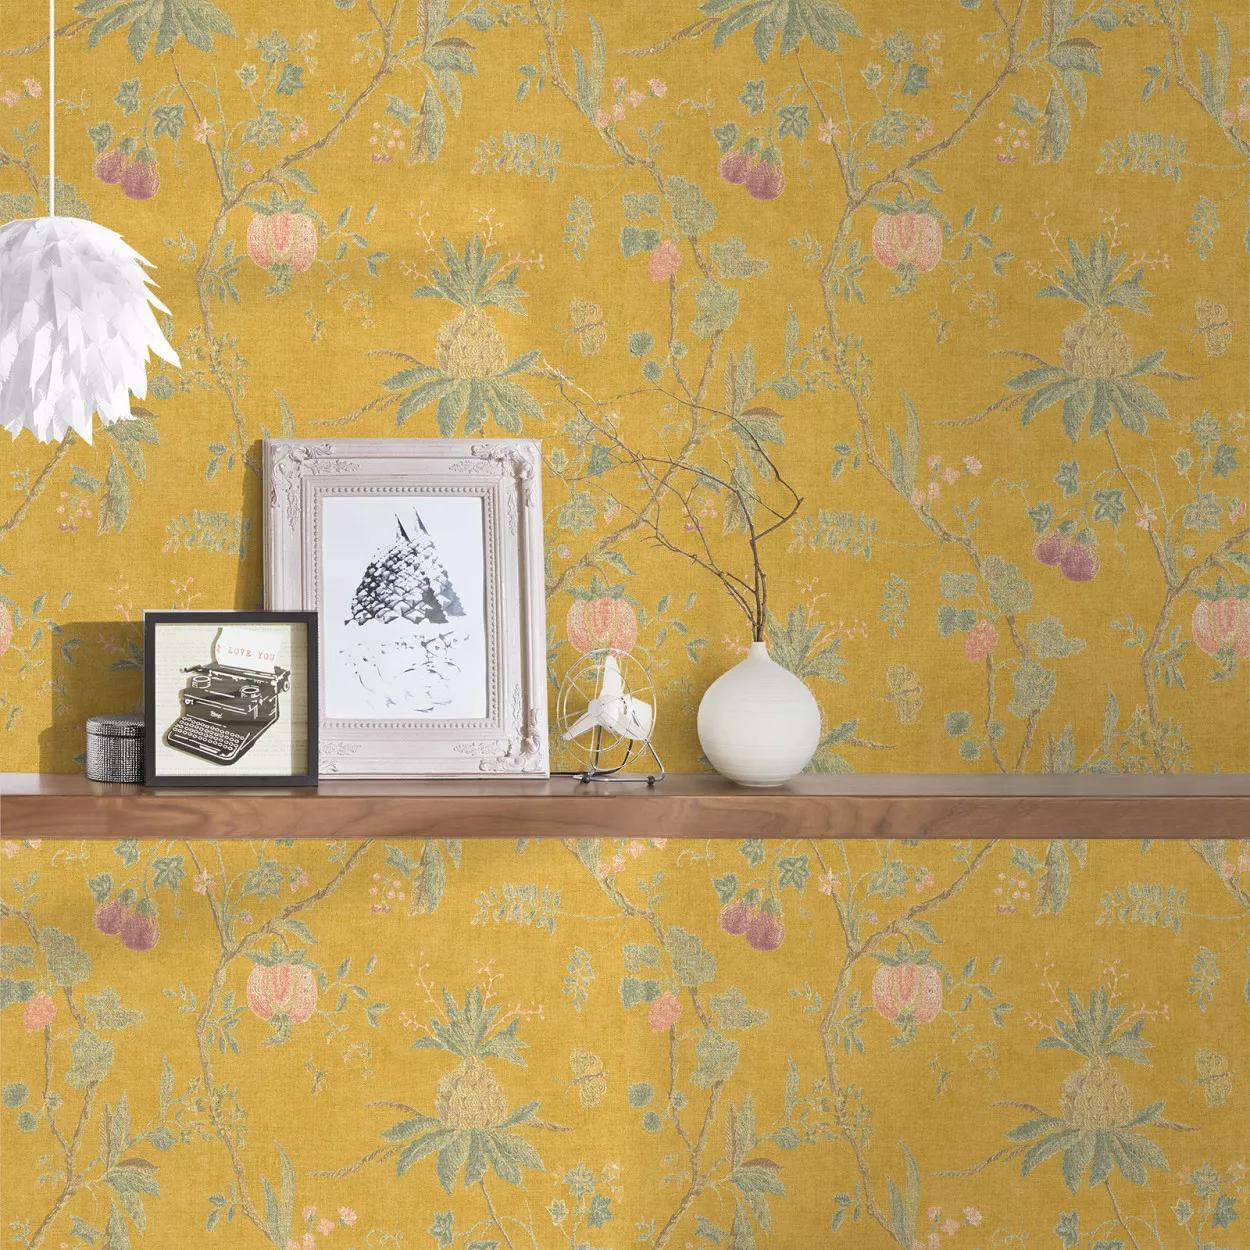 Sárga vlies tapéta trópusi virág mintával